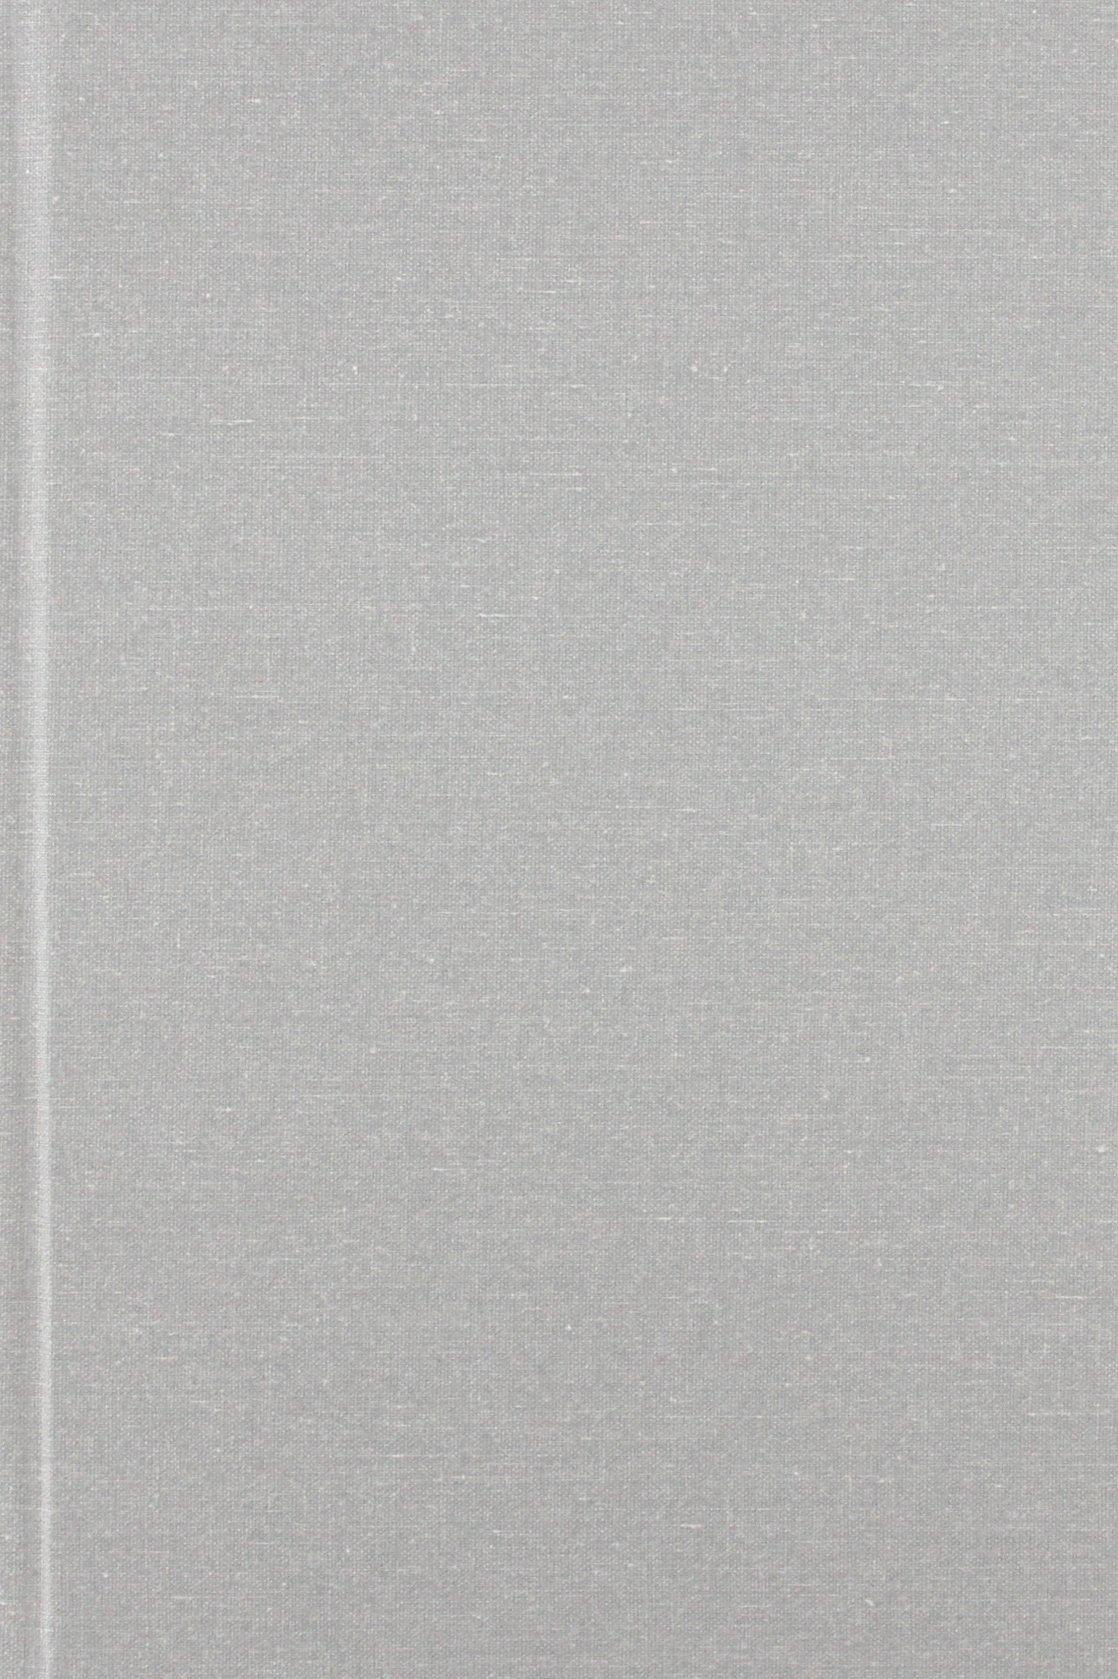 Read Online The Gospel According to St. John 1-10 (Calvin's Commentaries (Calvin's Commentary) pdf epub